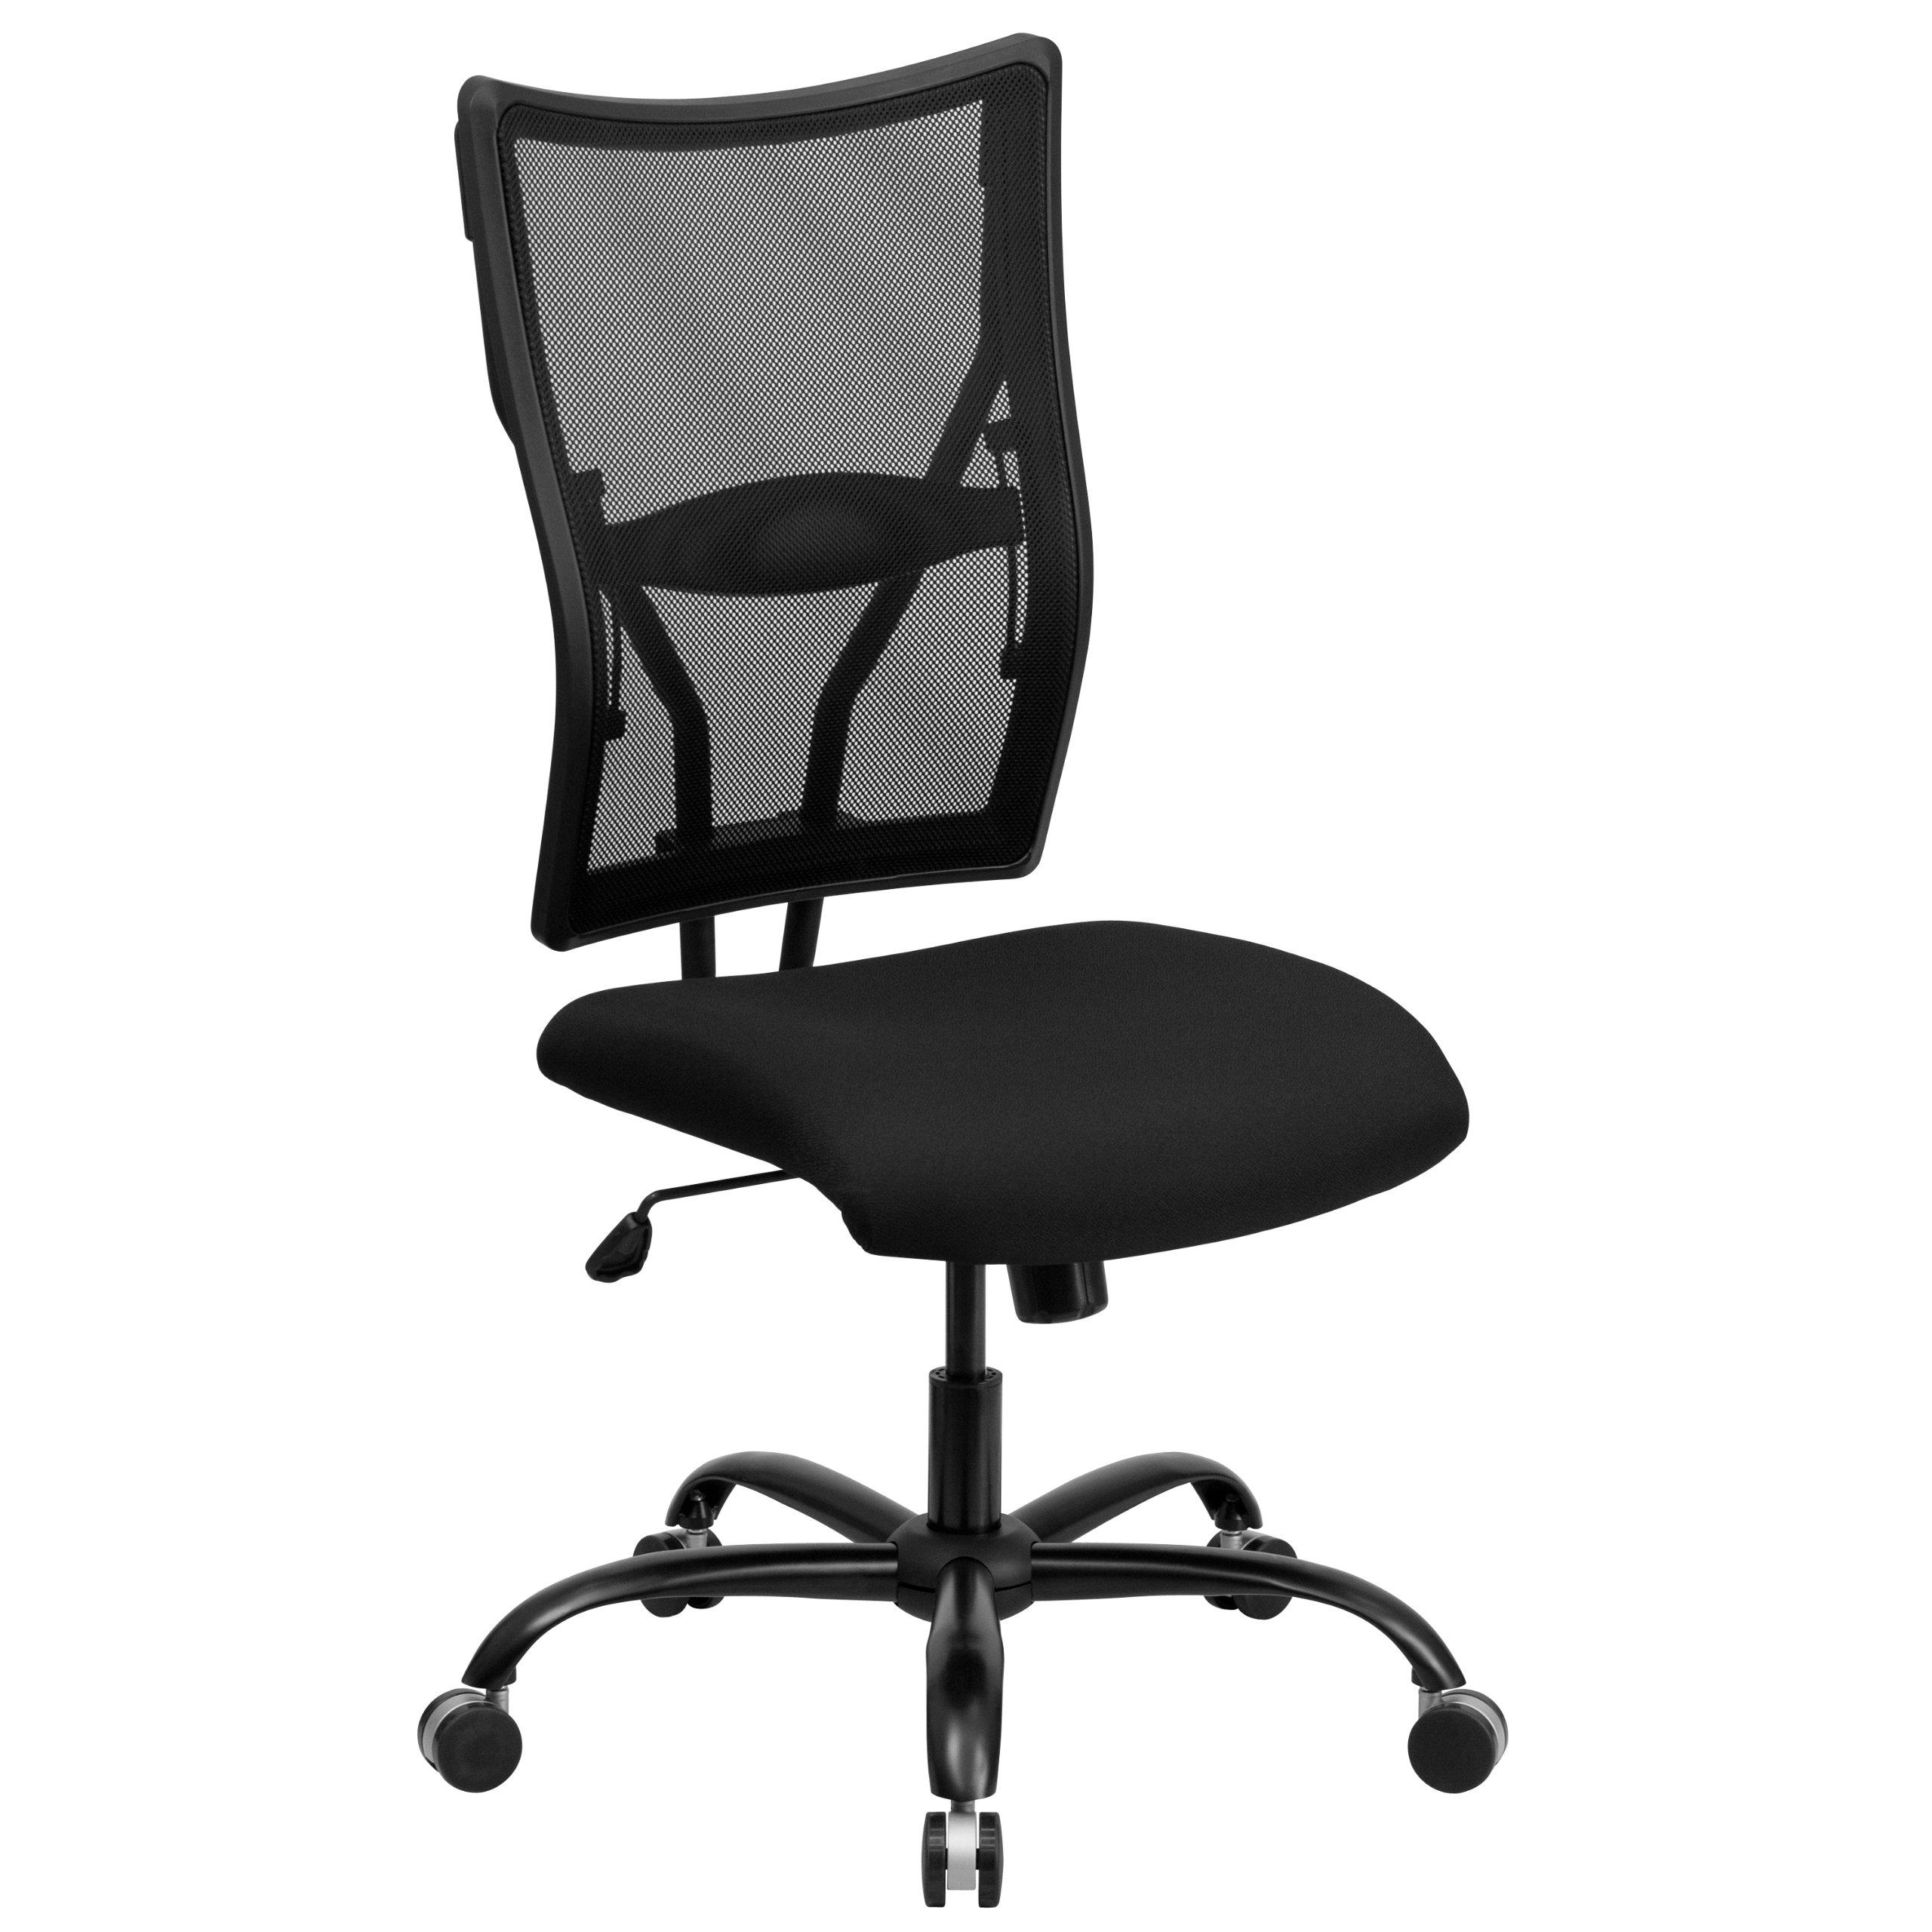 Flash Furniture HERCULES Series Big & Tall 400 lb. Rated Black Mesh Executive Swivel Chair